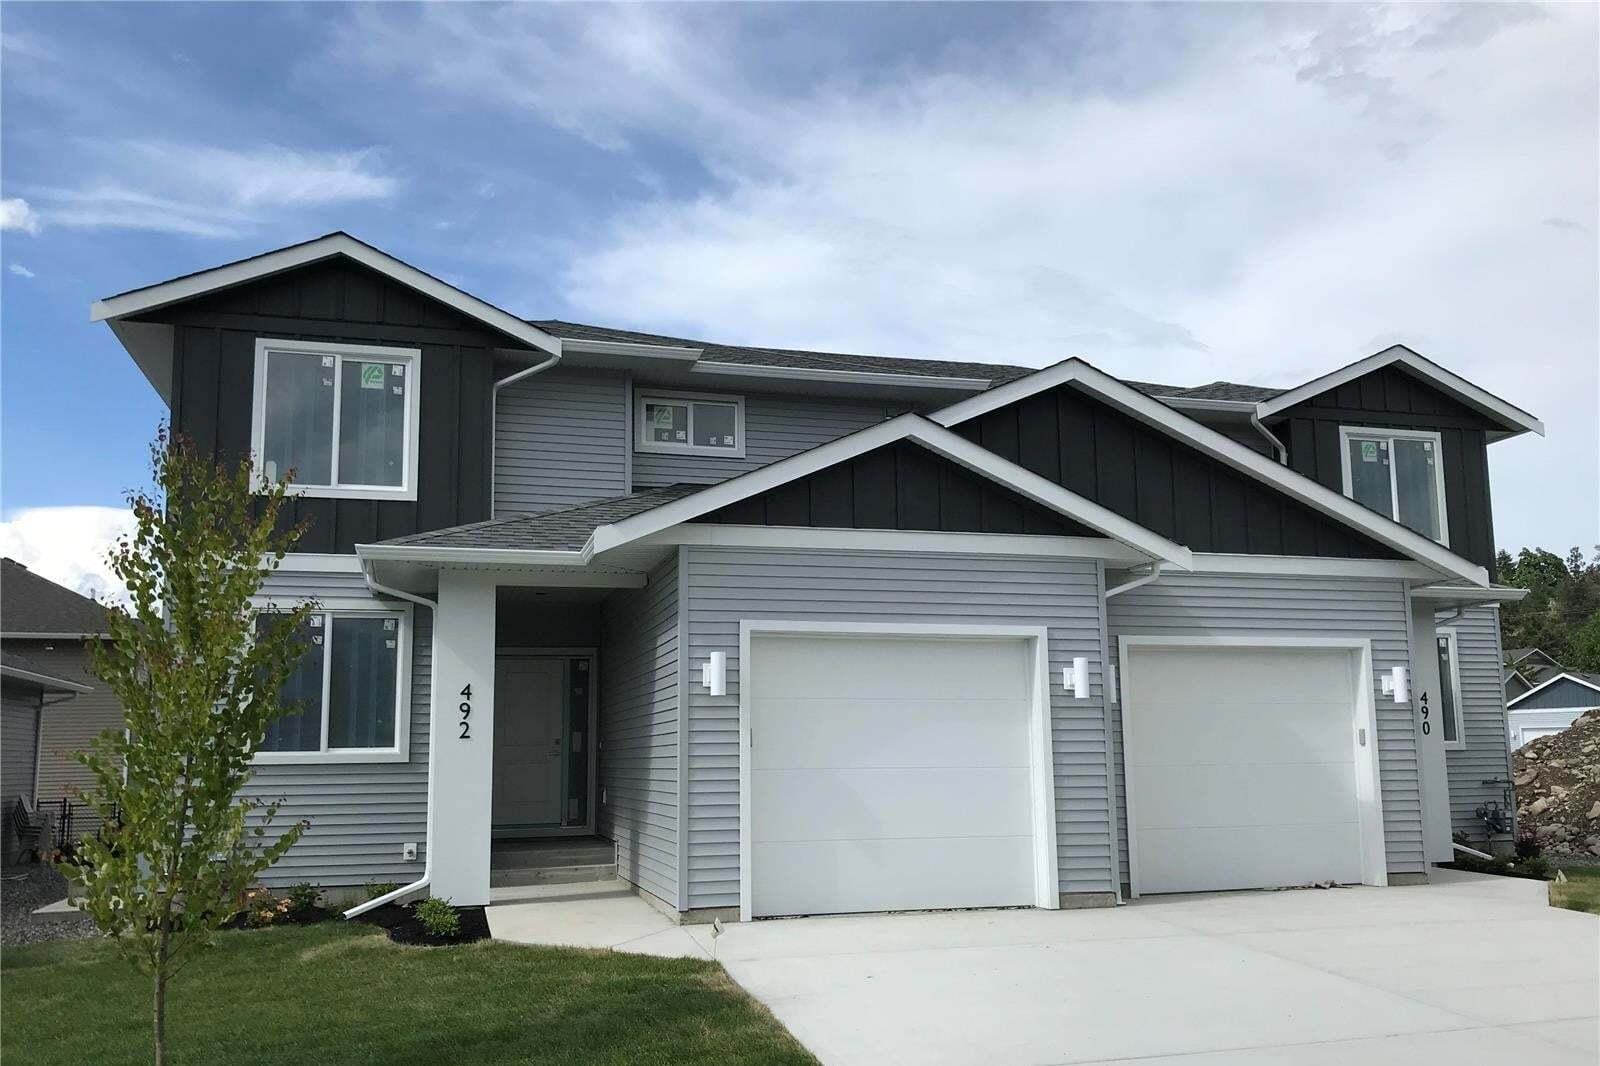 Townhouse for sale at 490 Sugars Ave Kelowna British Columbia - MLS: 10214630